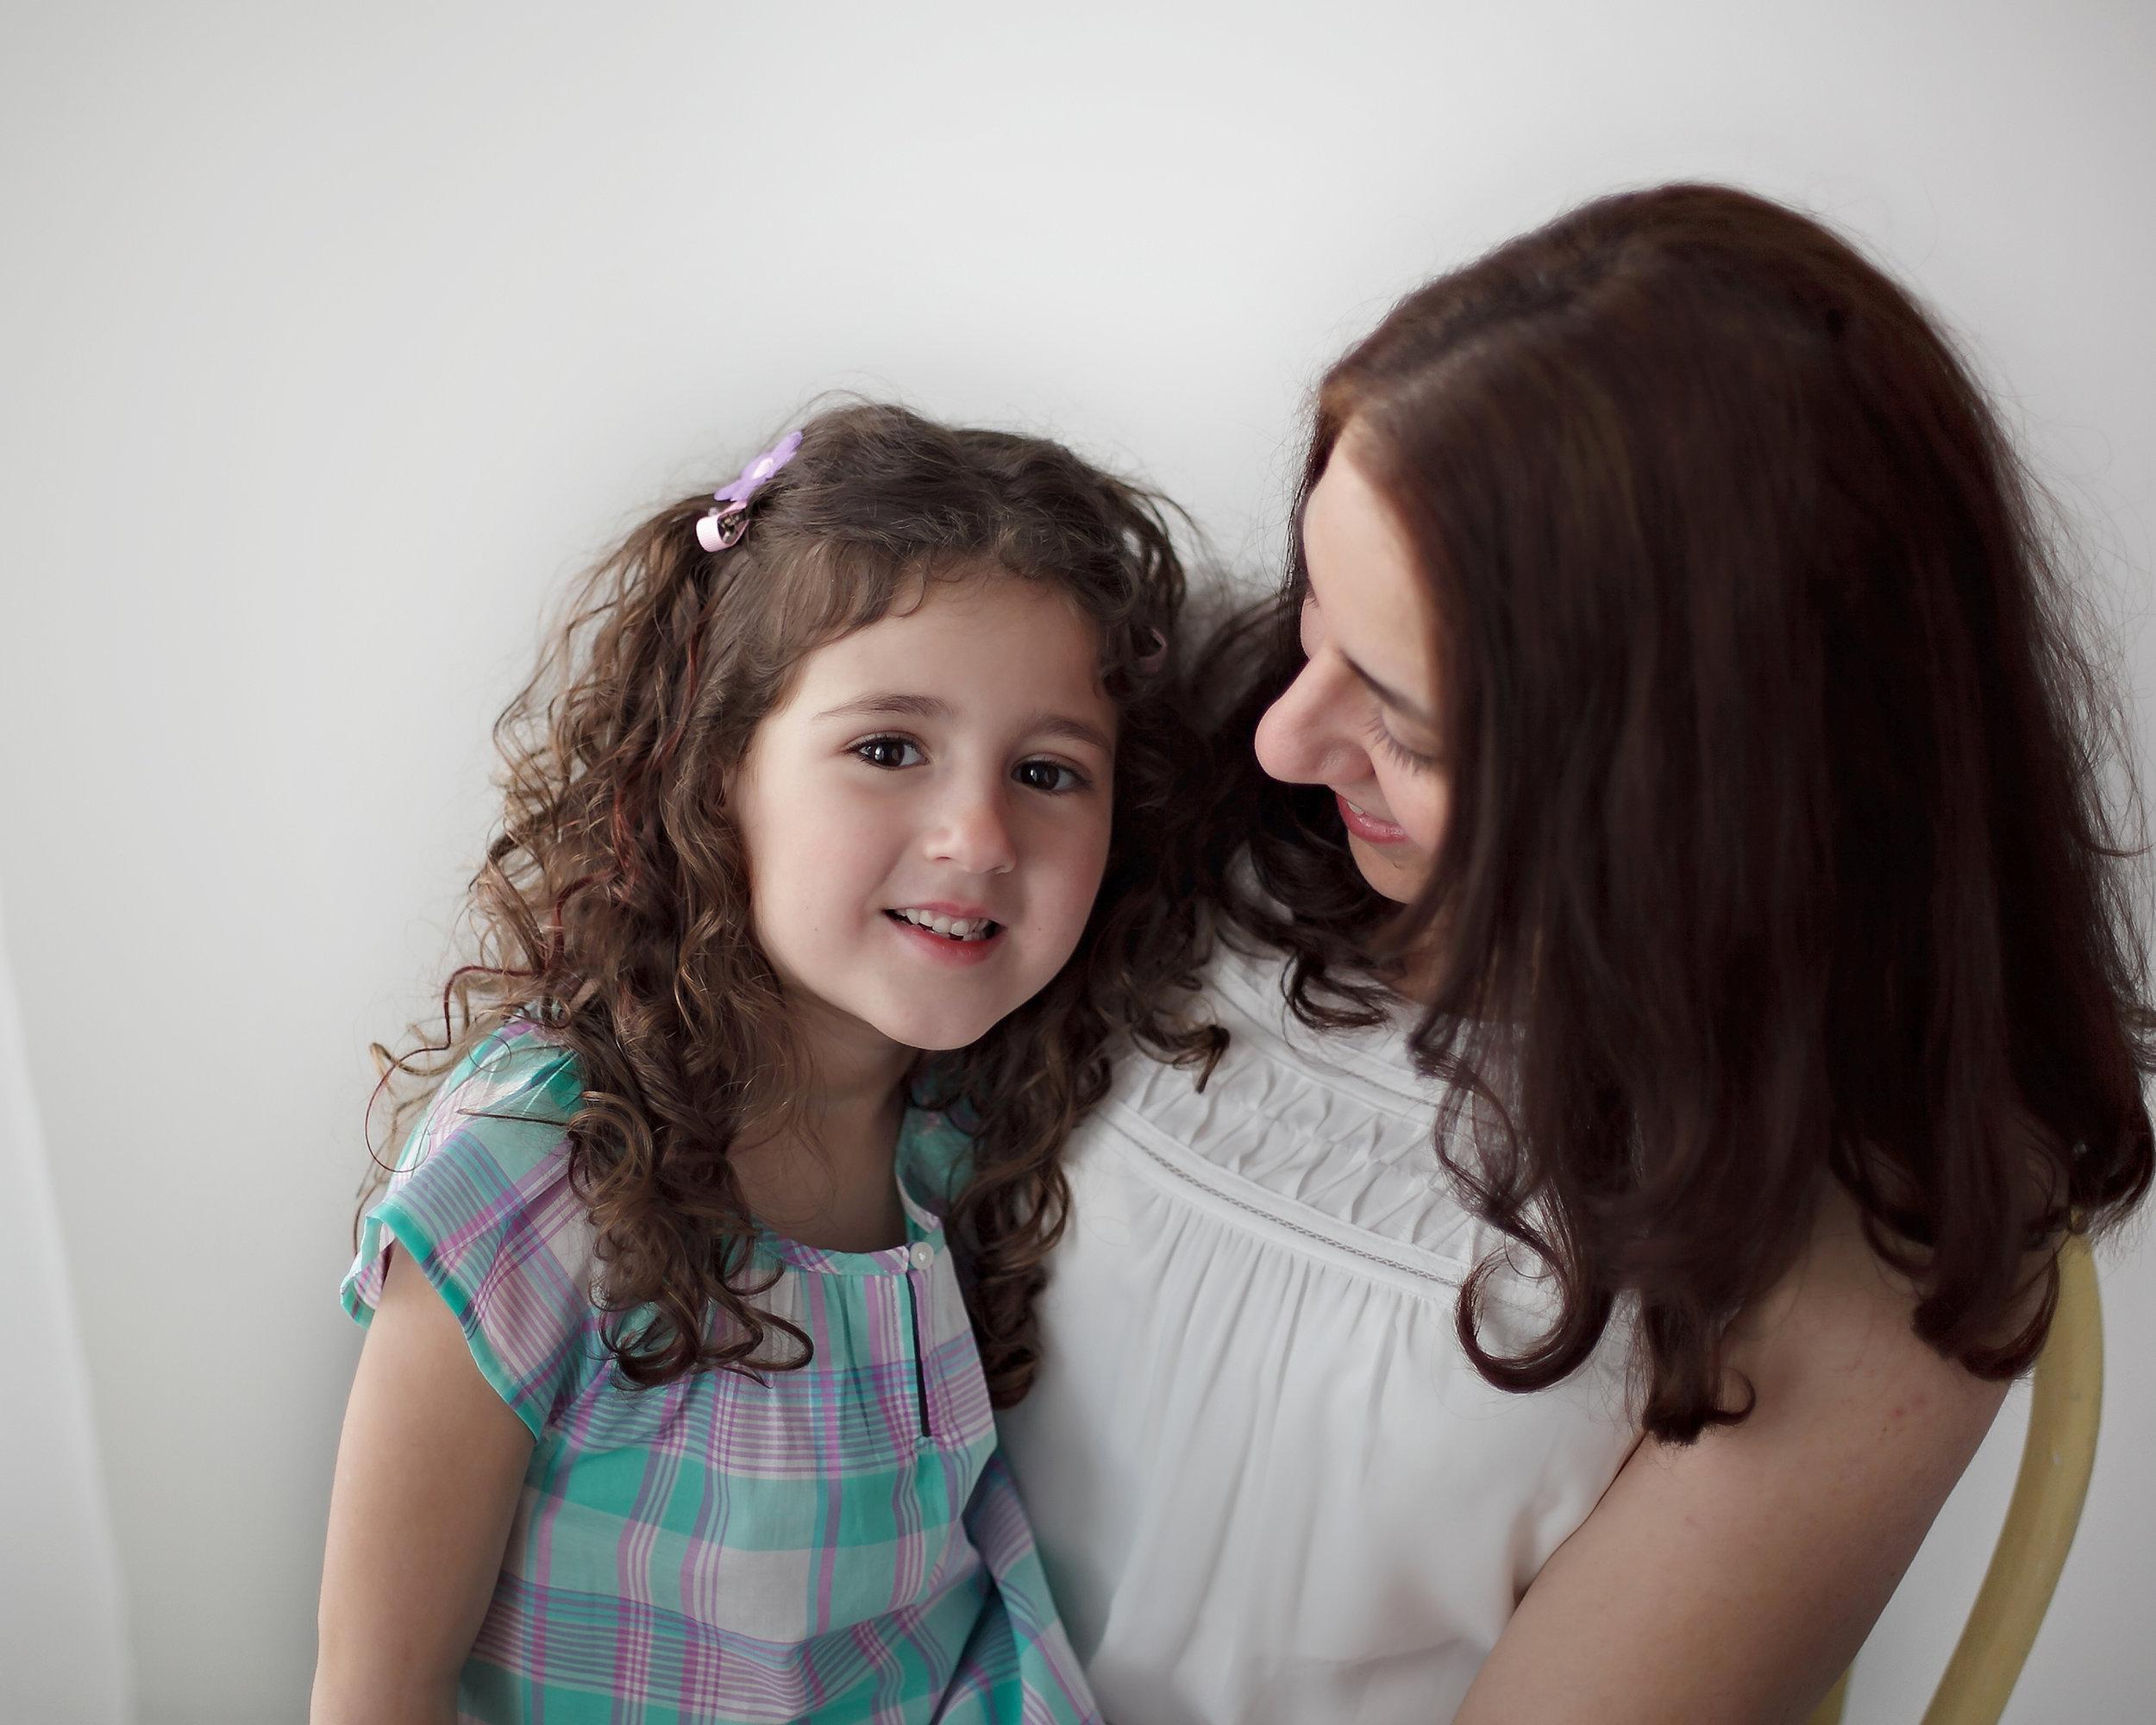 Oshawa_Mother_Daughter_Classic_Portrait_Petra_King_Photography